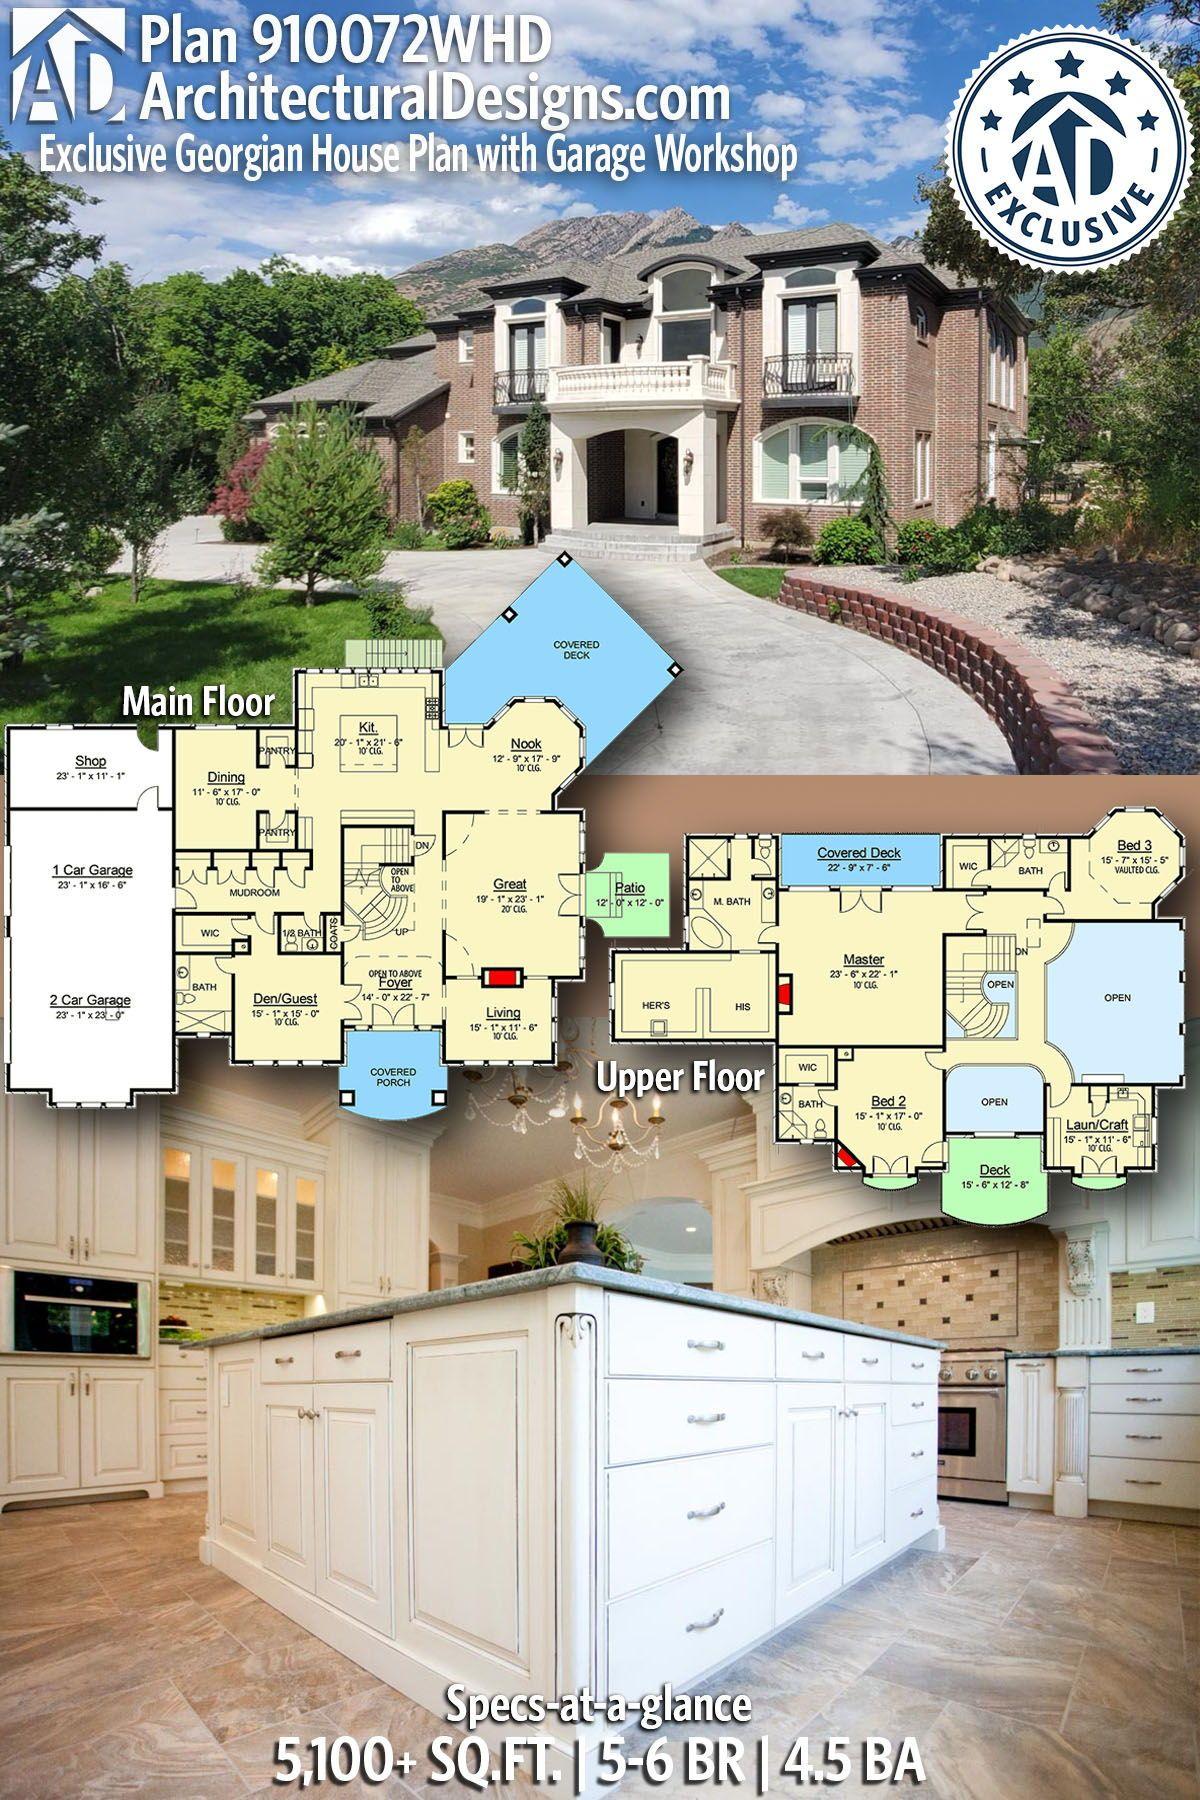 Plan 910072whd Exclusive Georgian House Plan With Garage Workshop In 2020 Garage House Plans Exclusive House Plan Georgian Homes